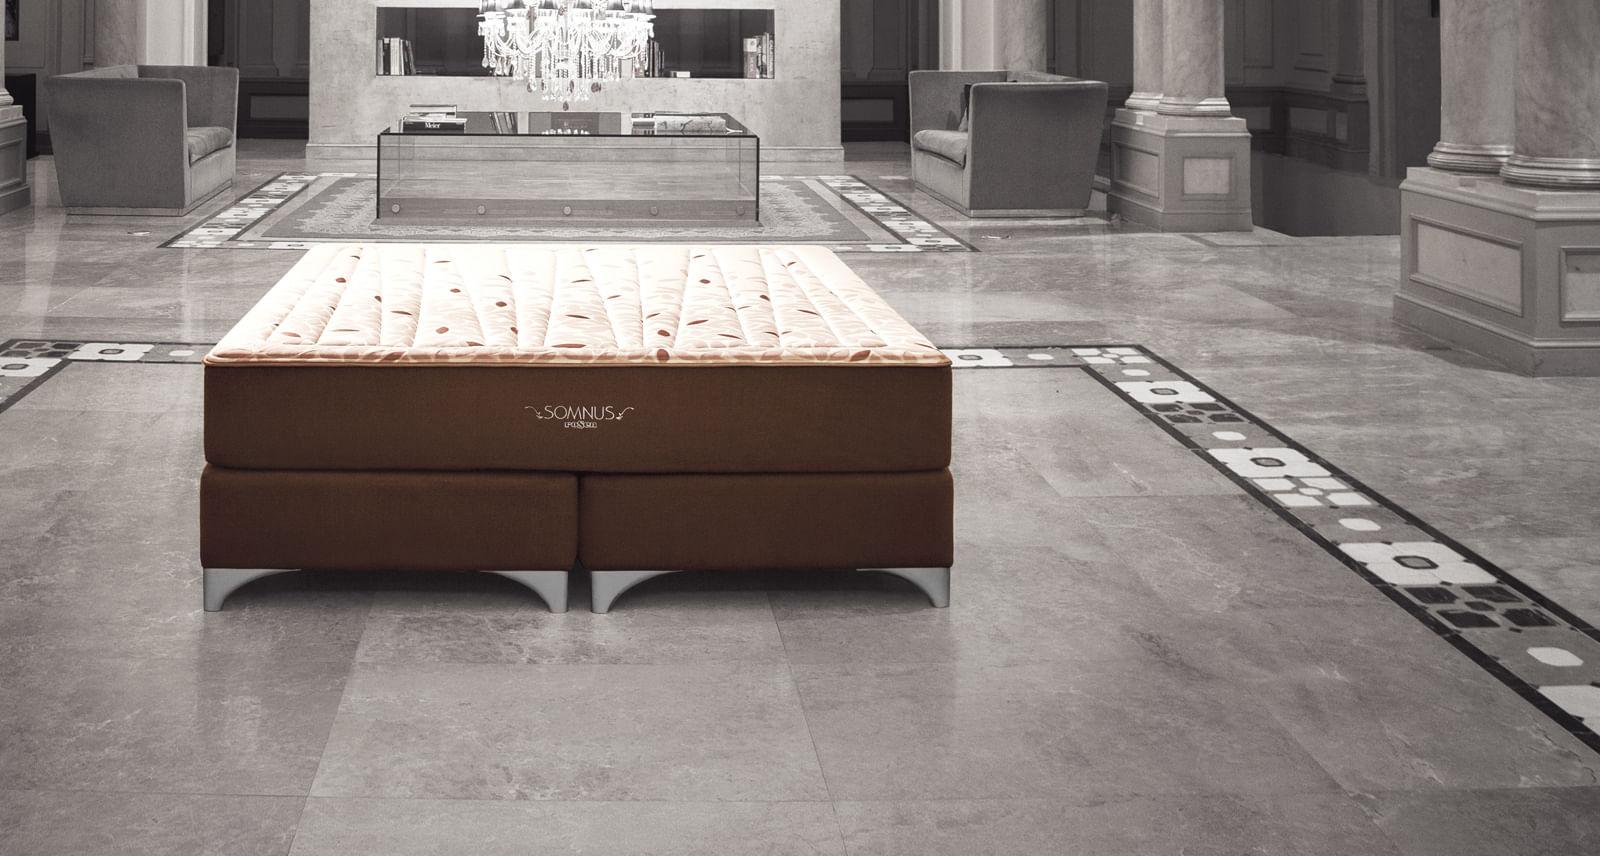 Dormitorio colchones box tarima muebles y m s rosen per for Colchones rosen